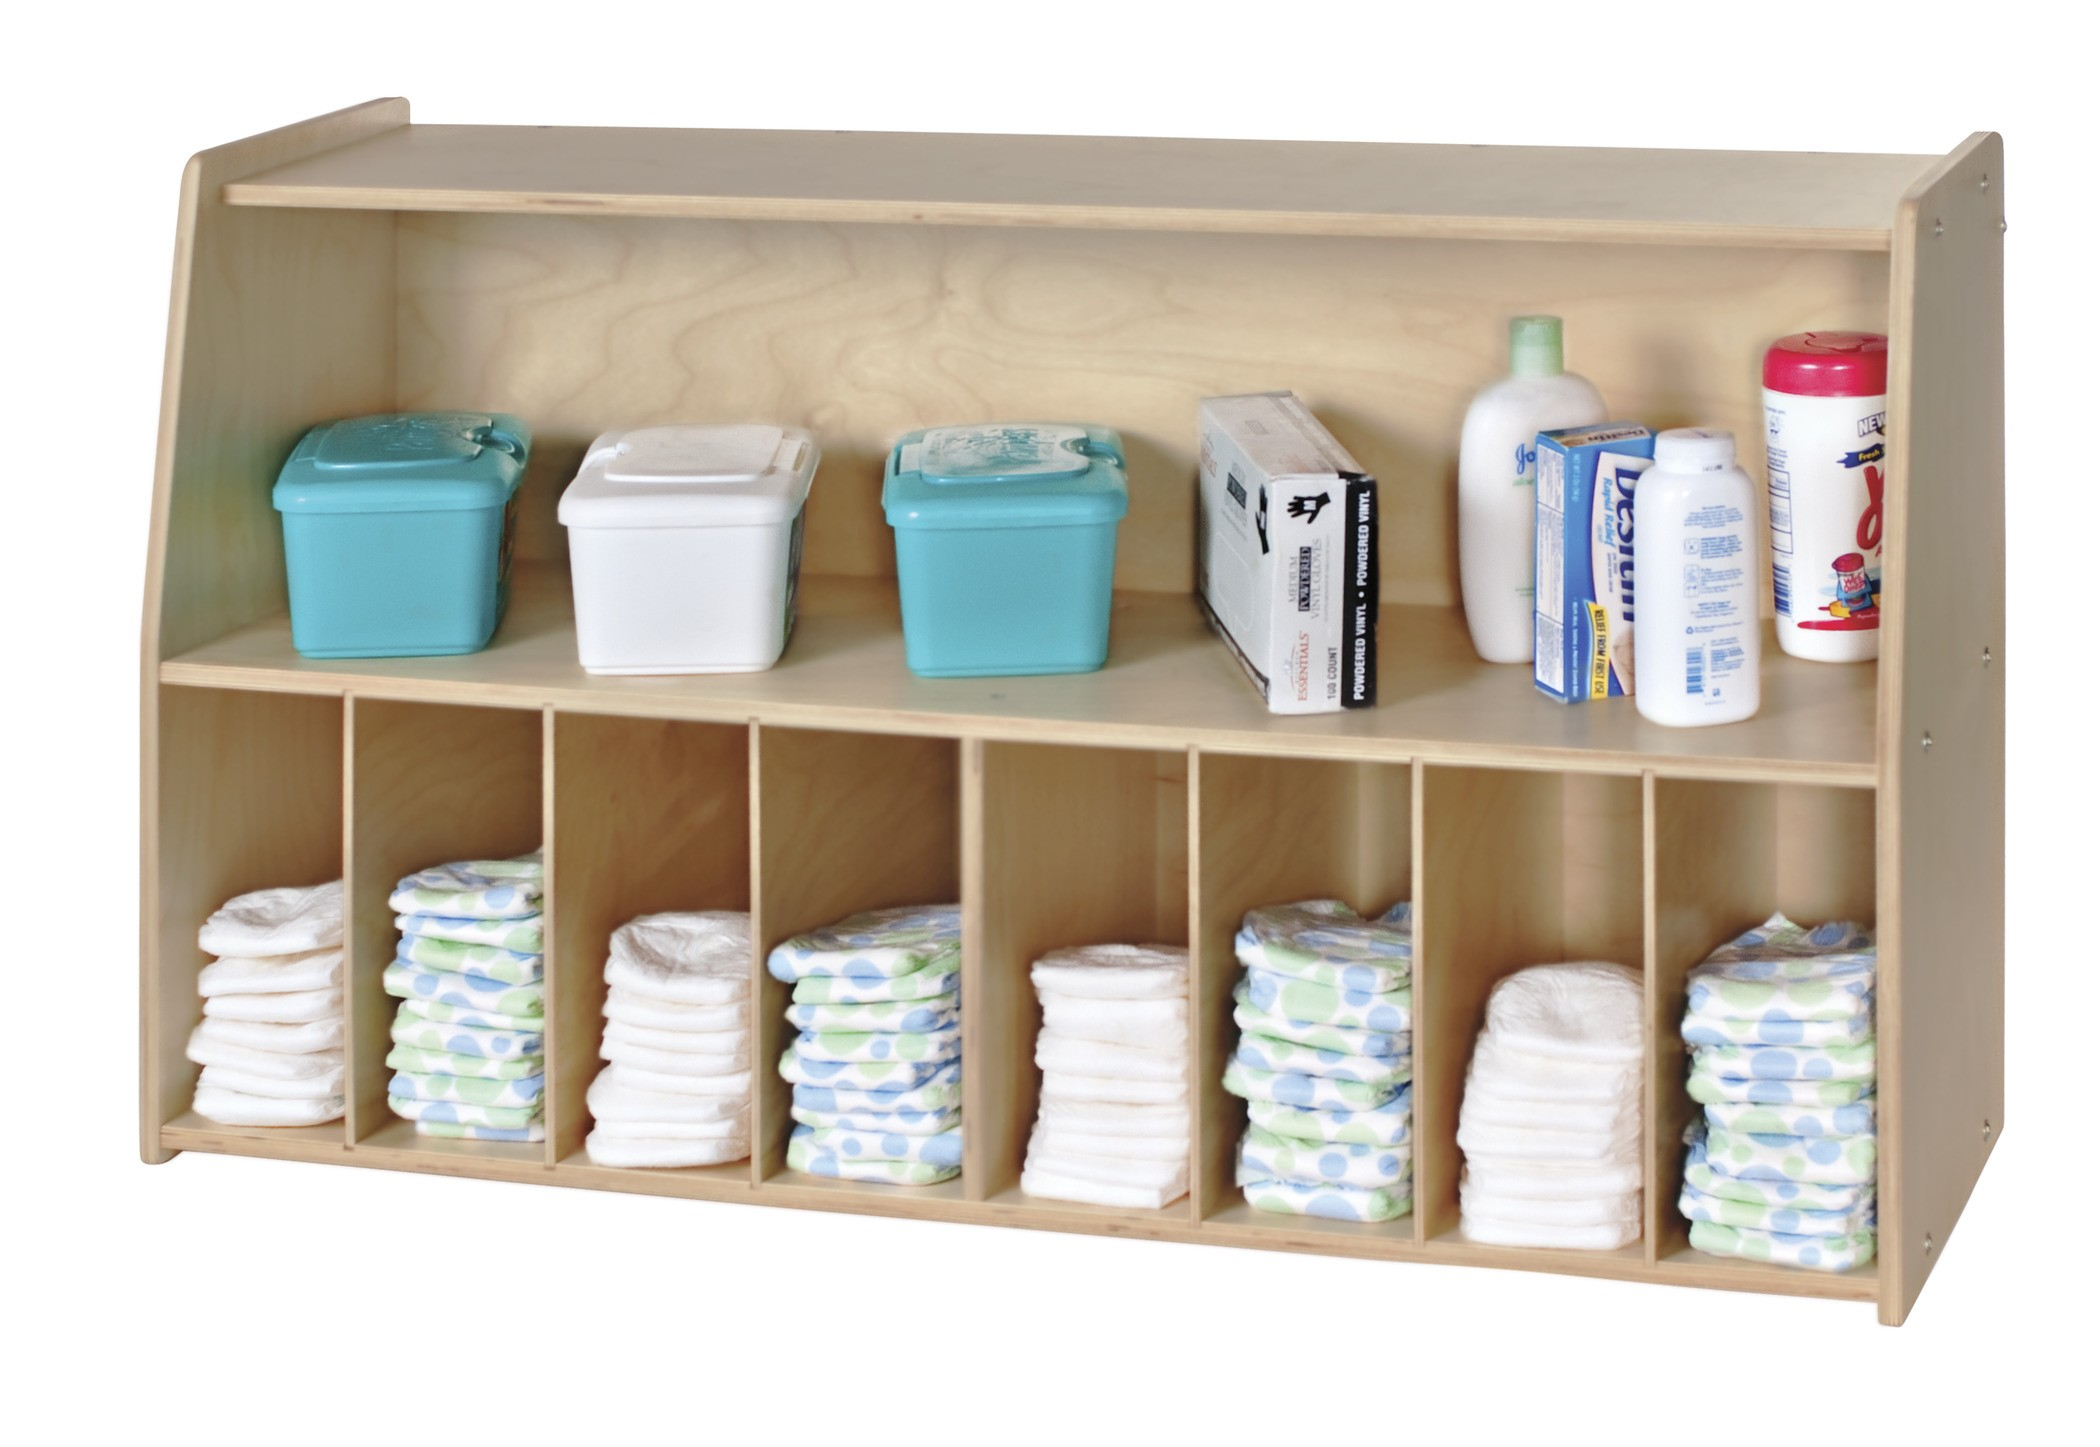 Safetycraft Diaper Organizer Change Tables Organizers And